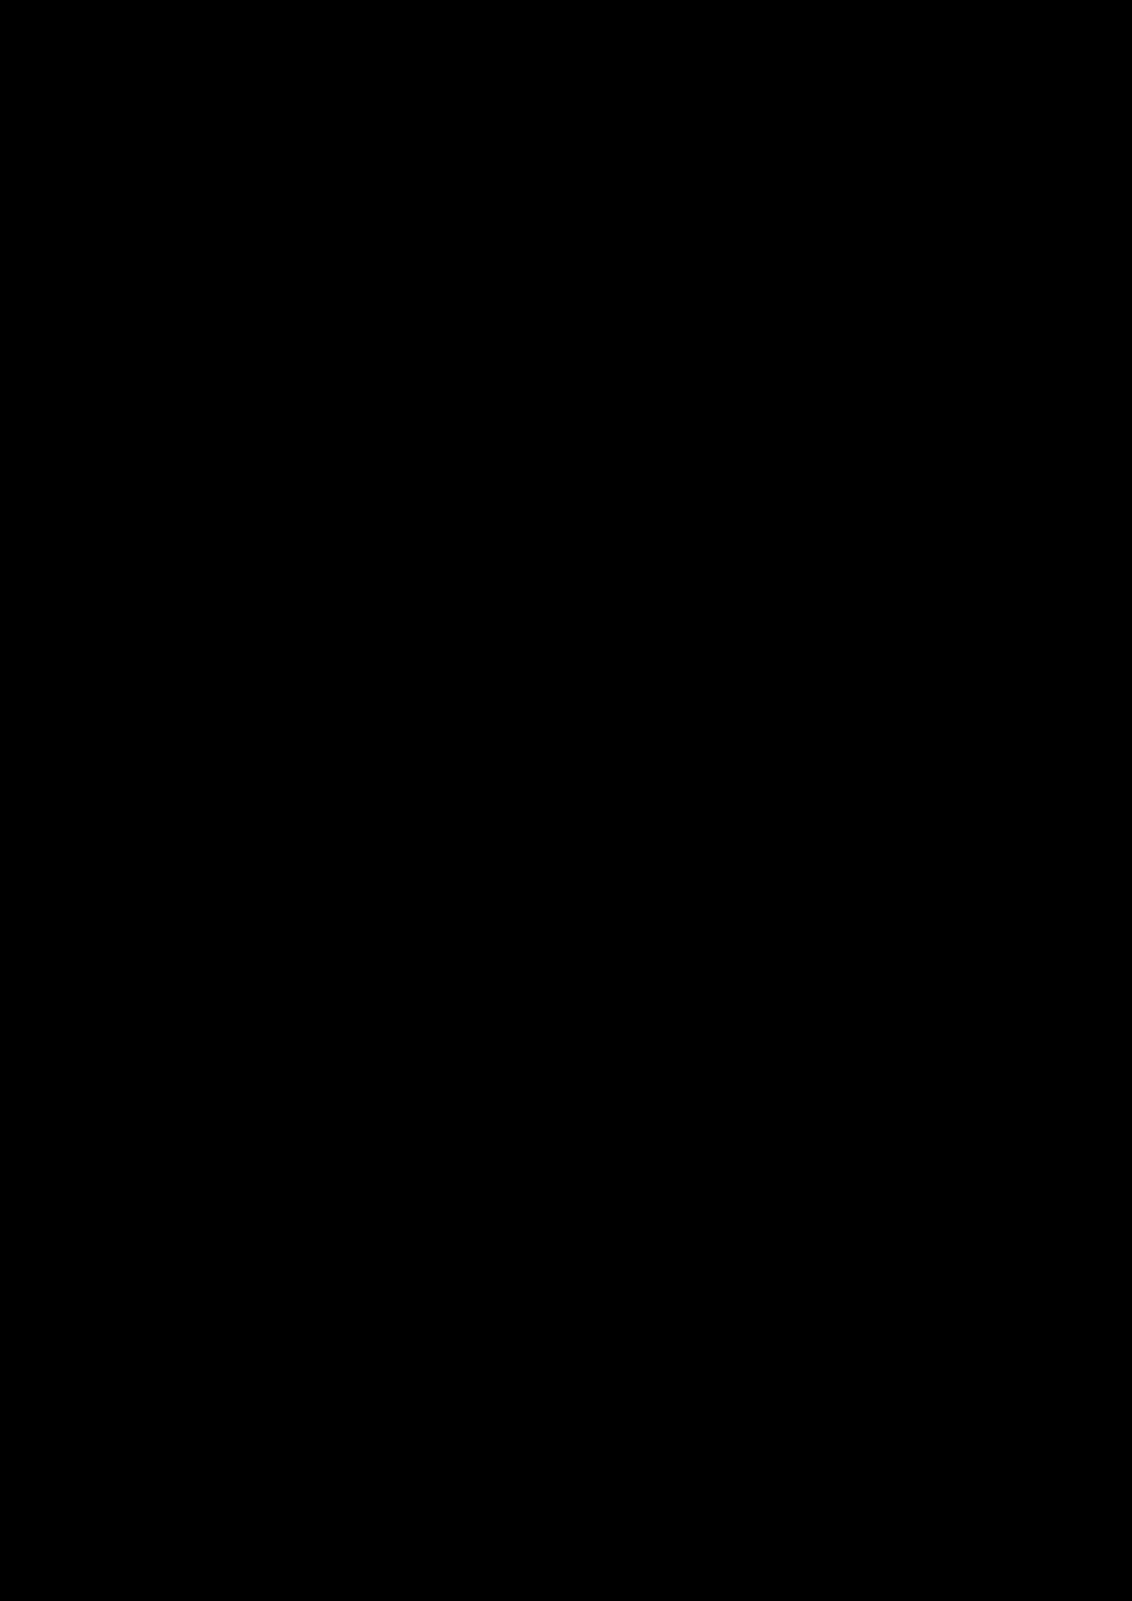 Belyiy sokol slide, Image 84